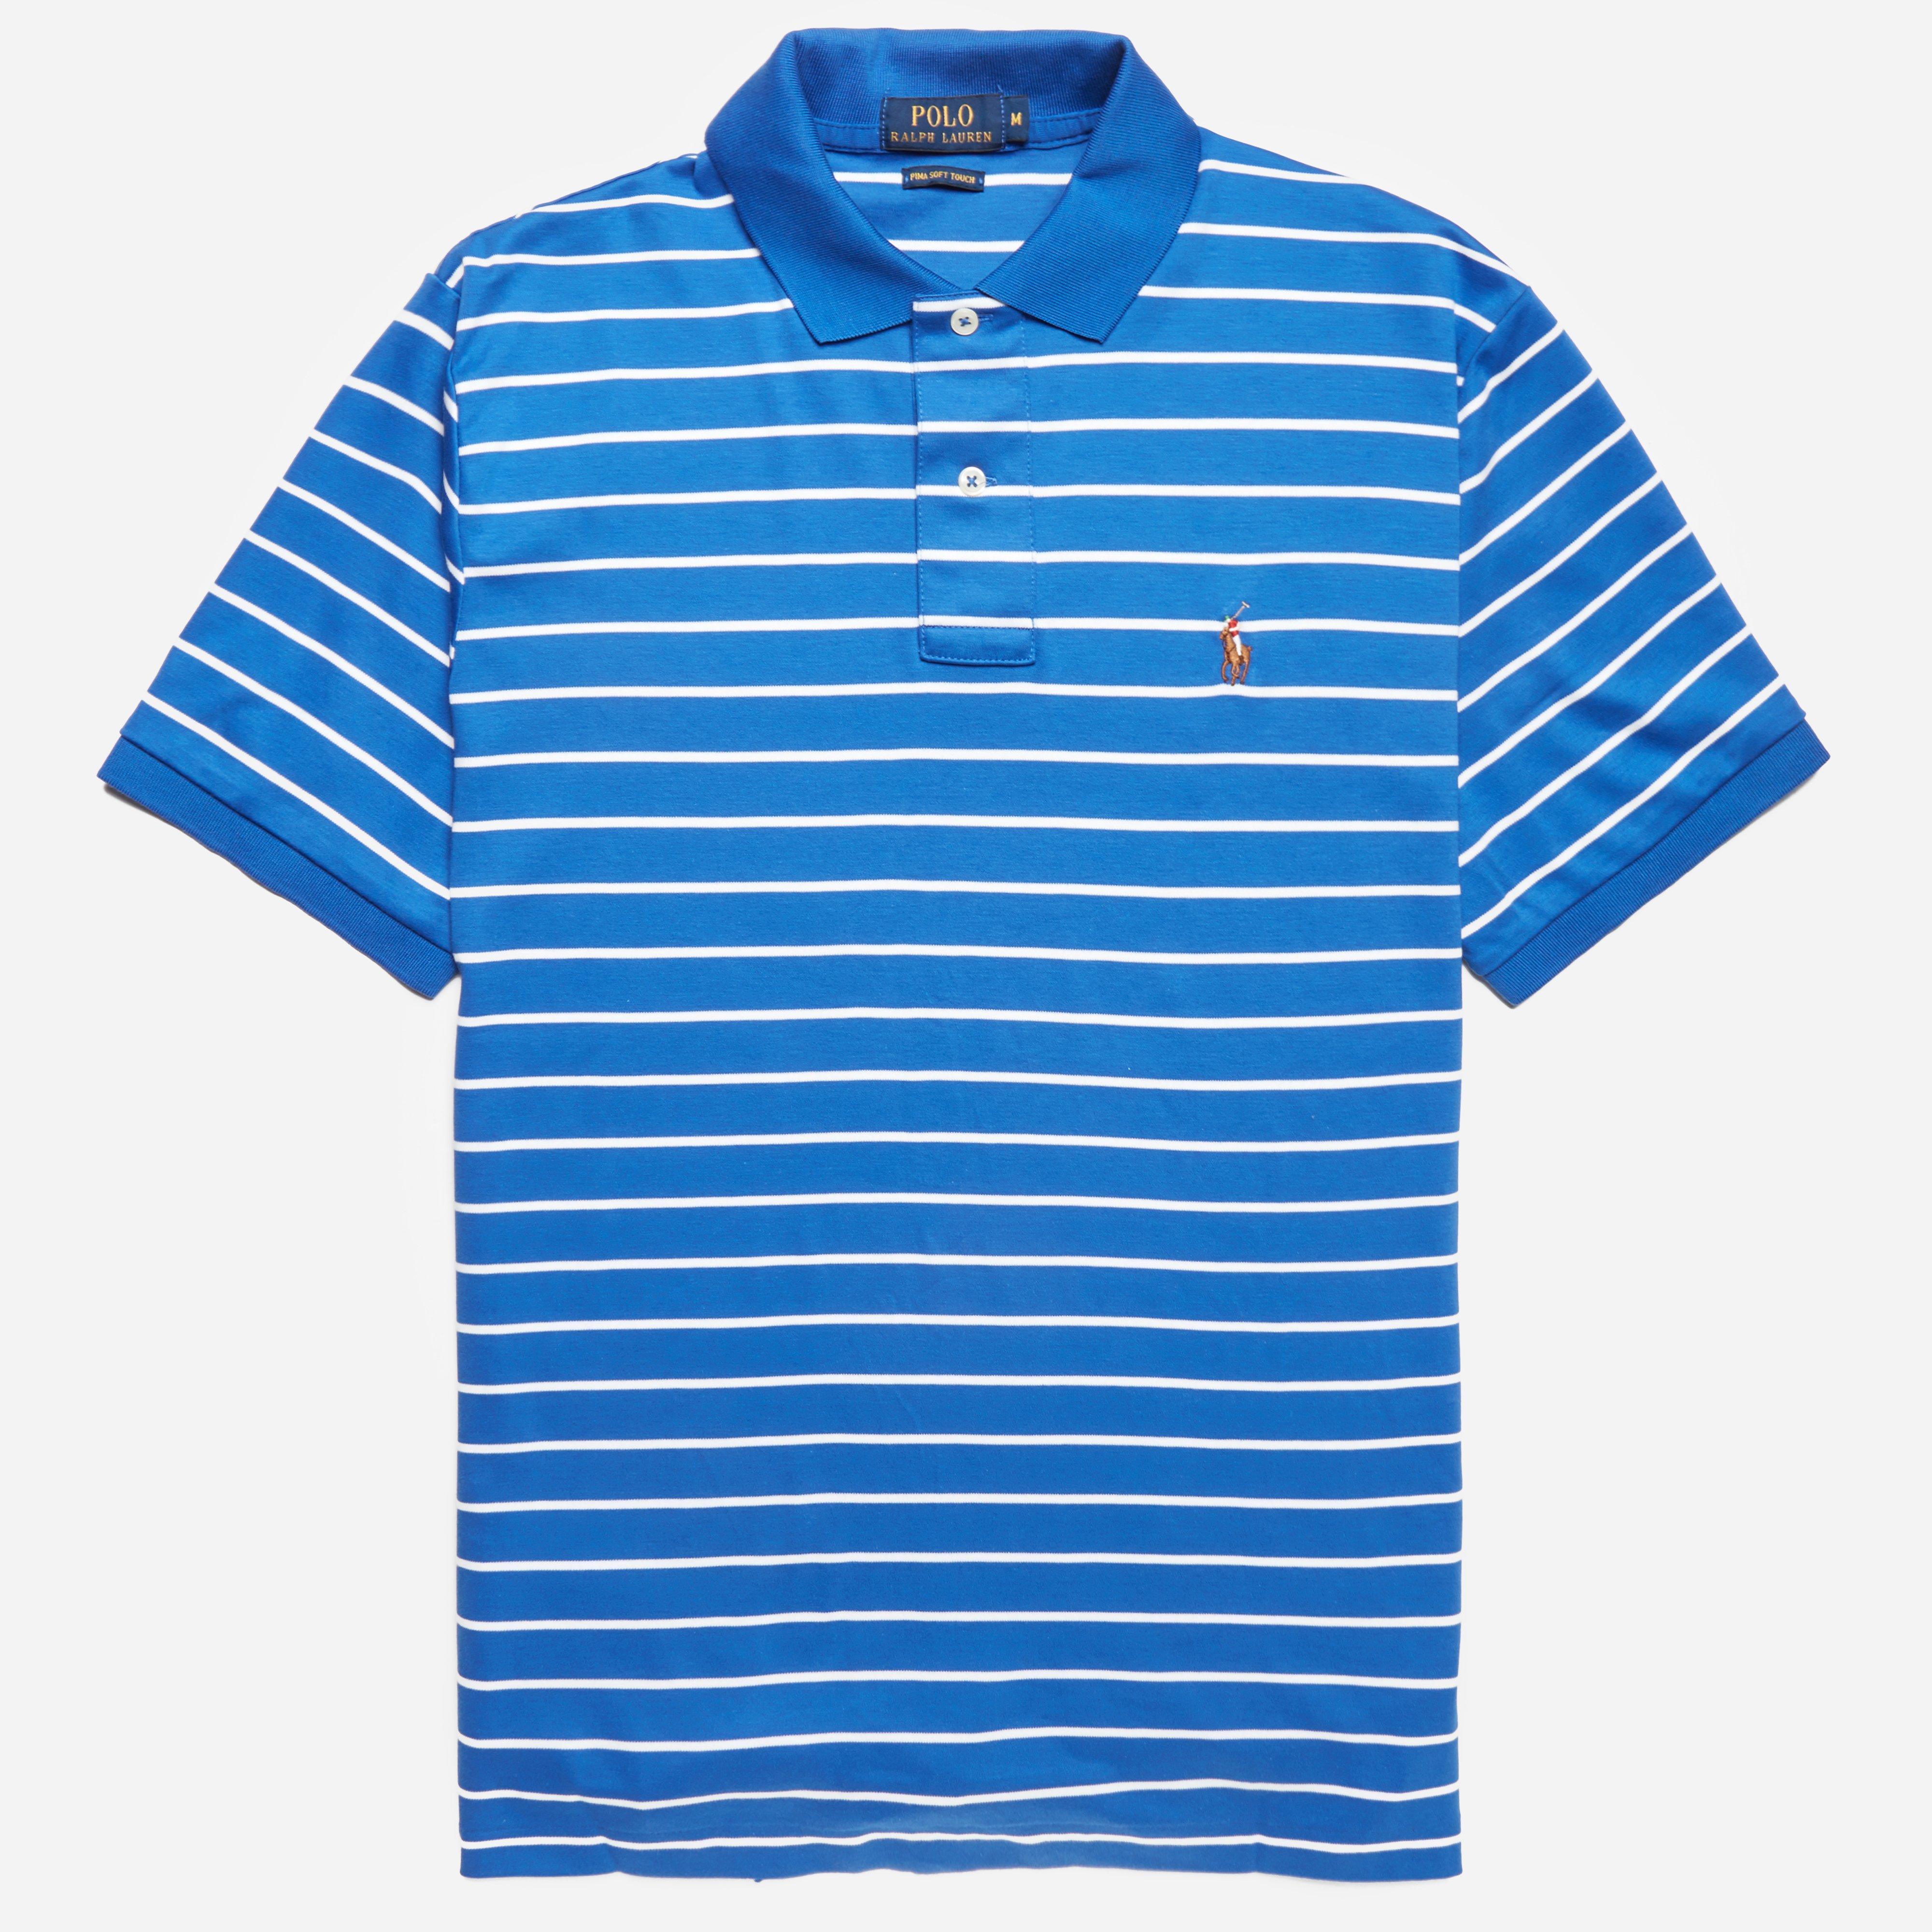 Polo Ralph Lauren Striped Pima Polo Shirt